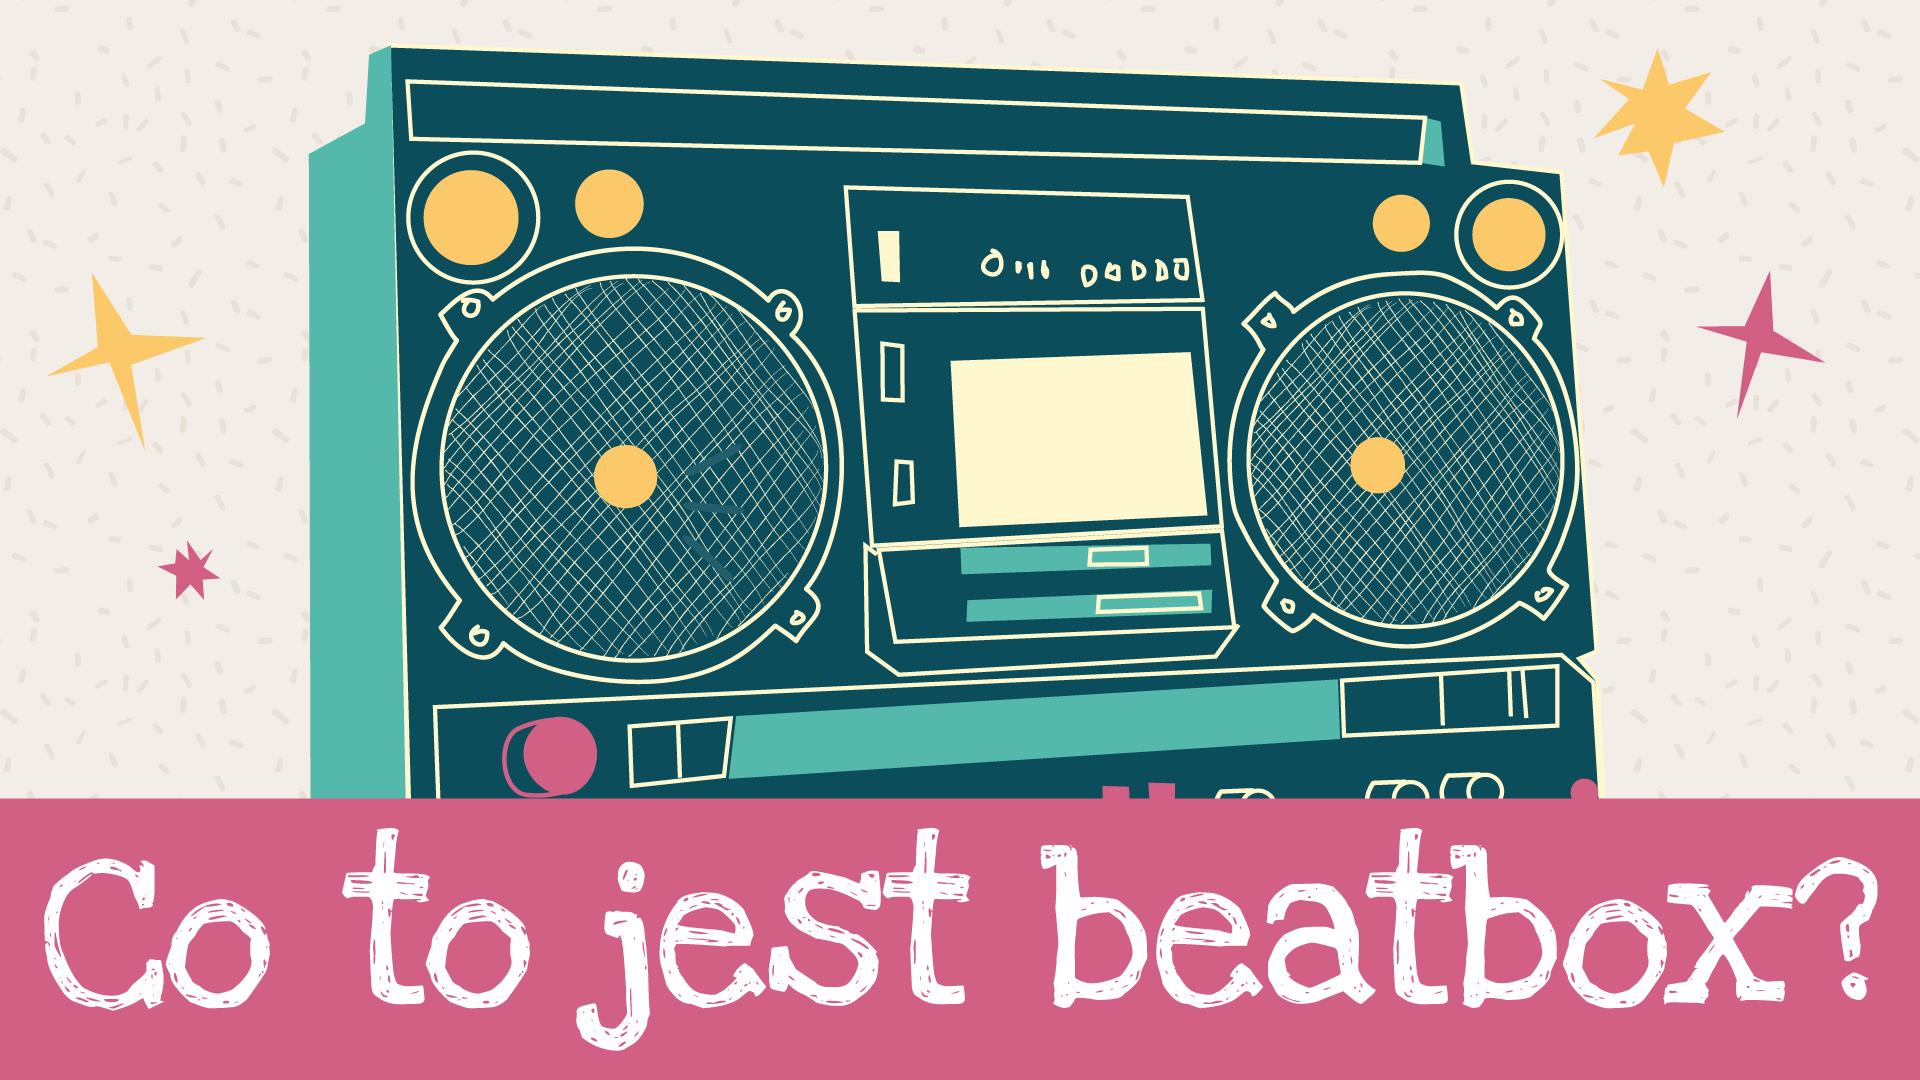 Boombox clipart beatbox. Video kids